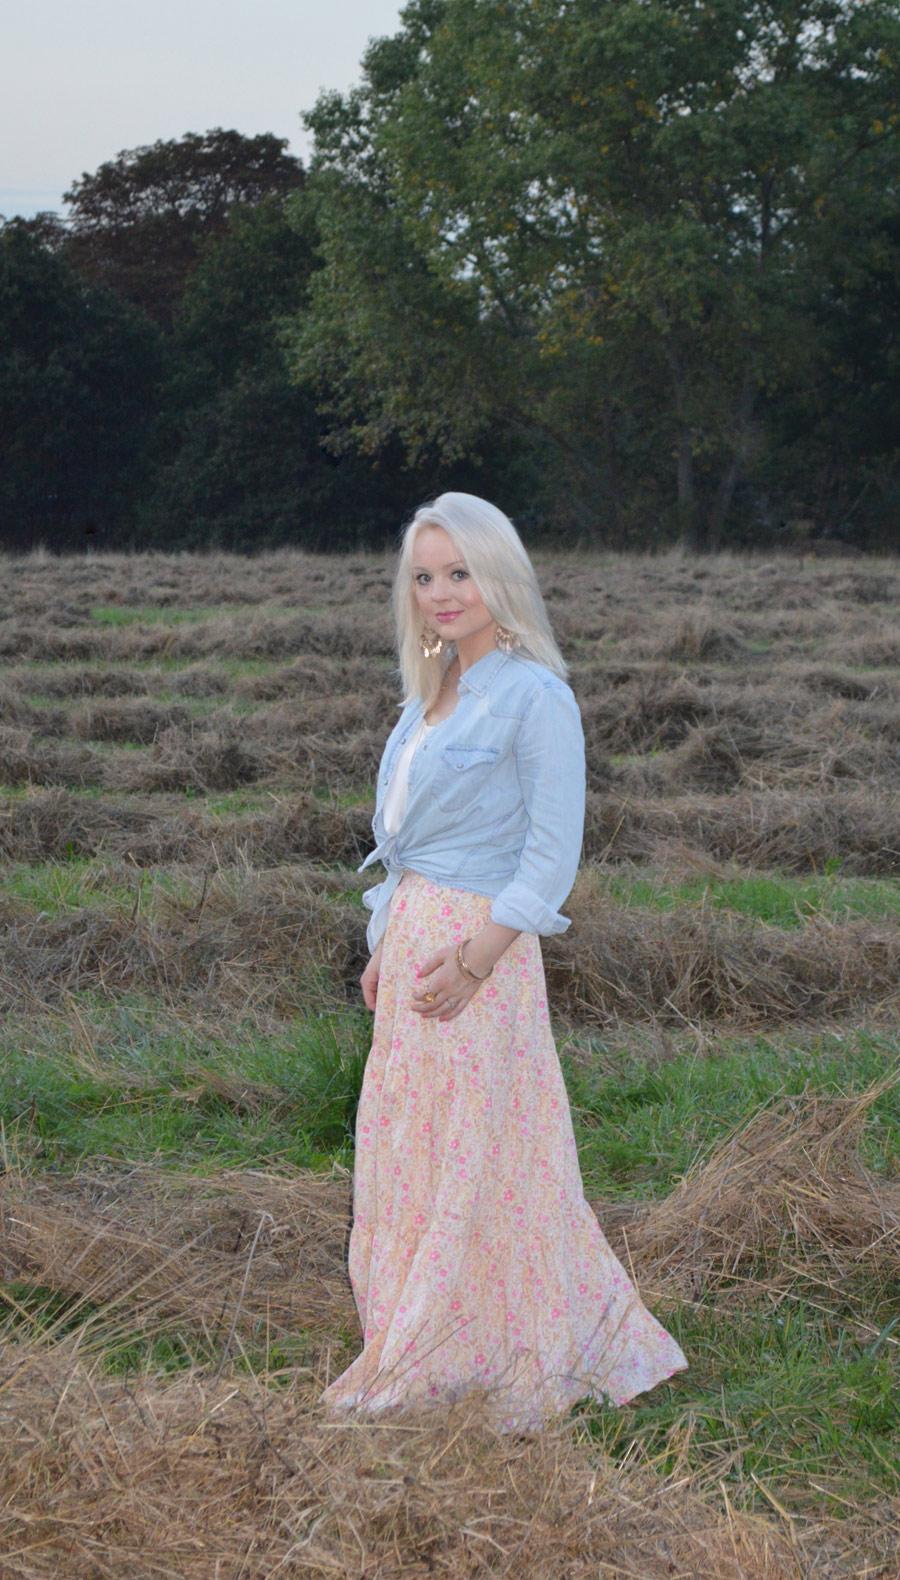 Gypsy-skirt